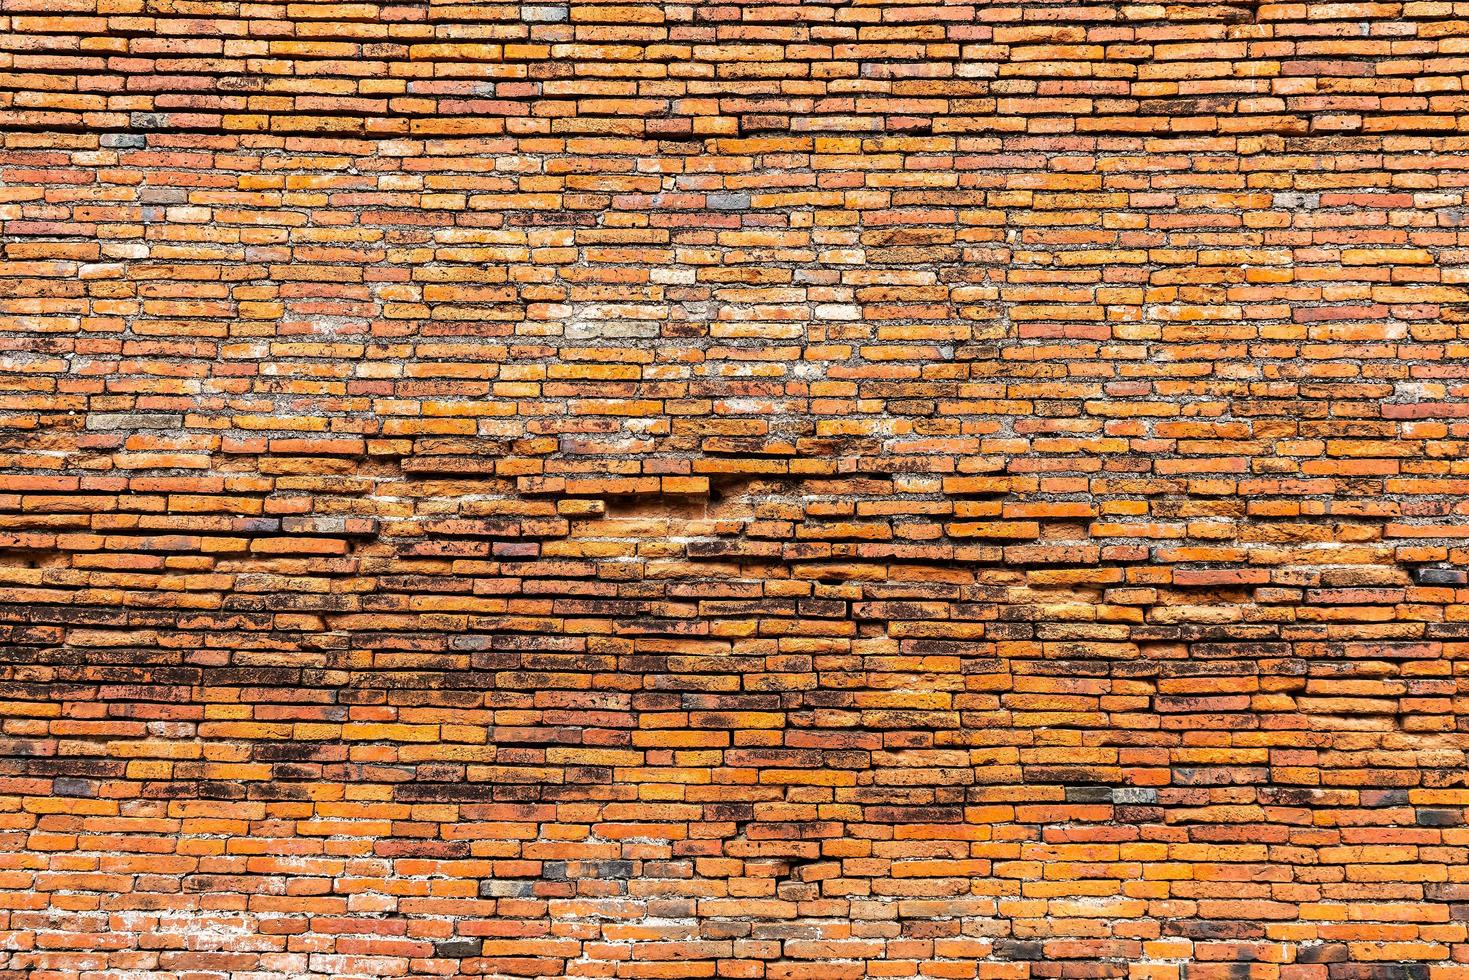 textura de la pared de ladrillo foto